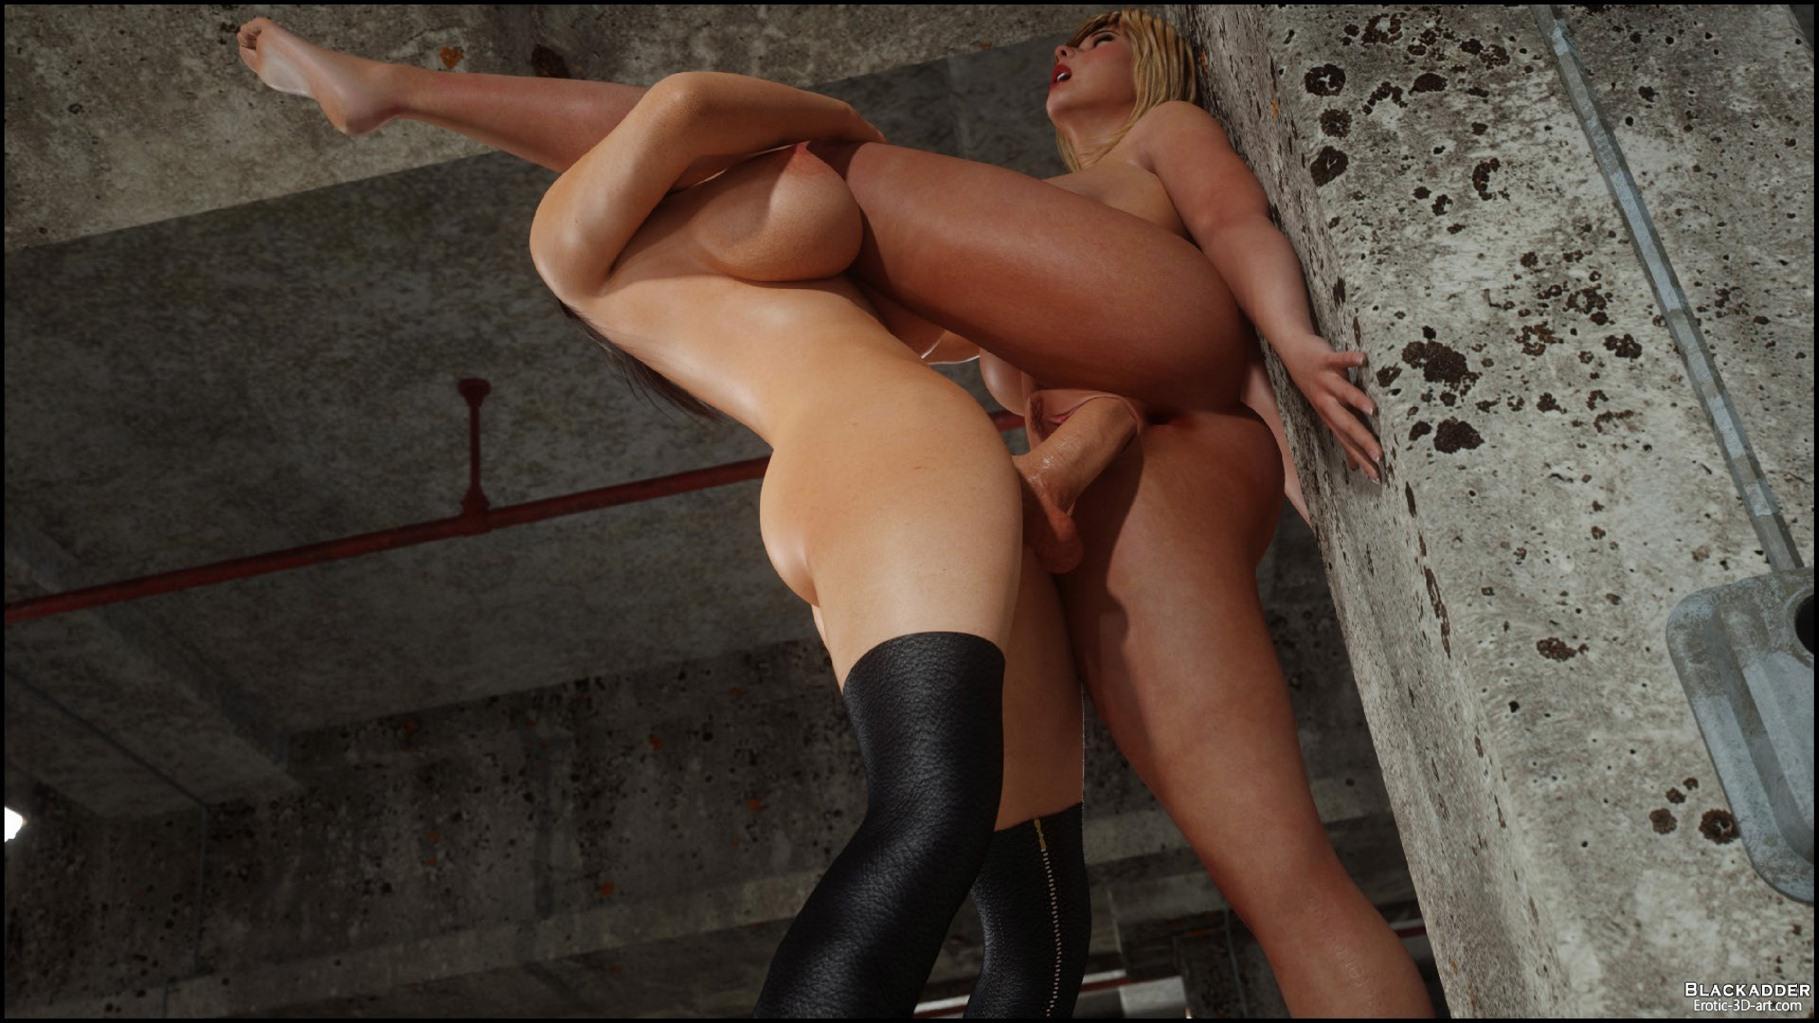 Futanari Huge Dickgirls Videos - Free